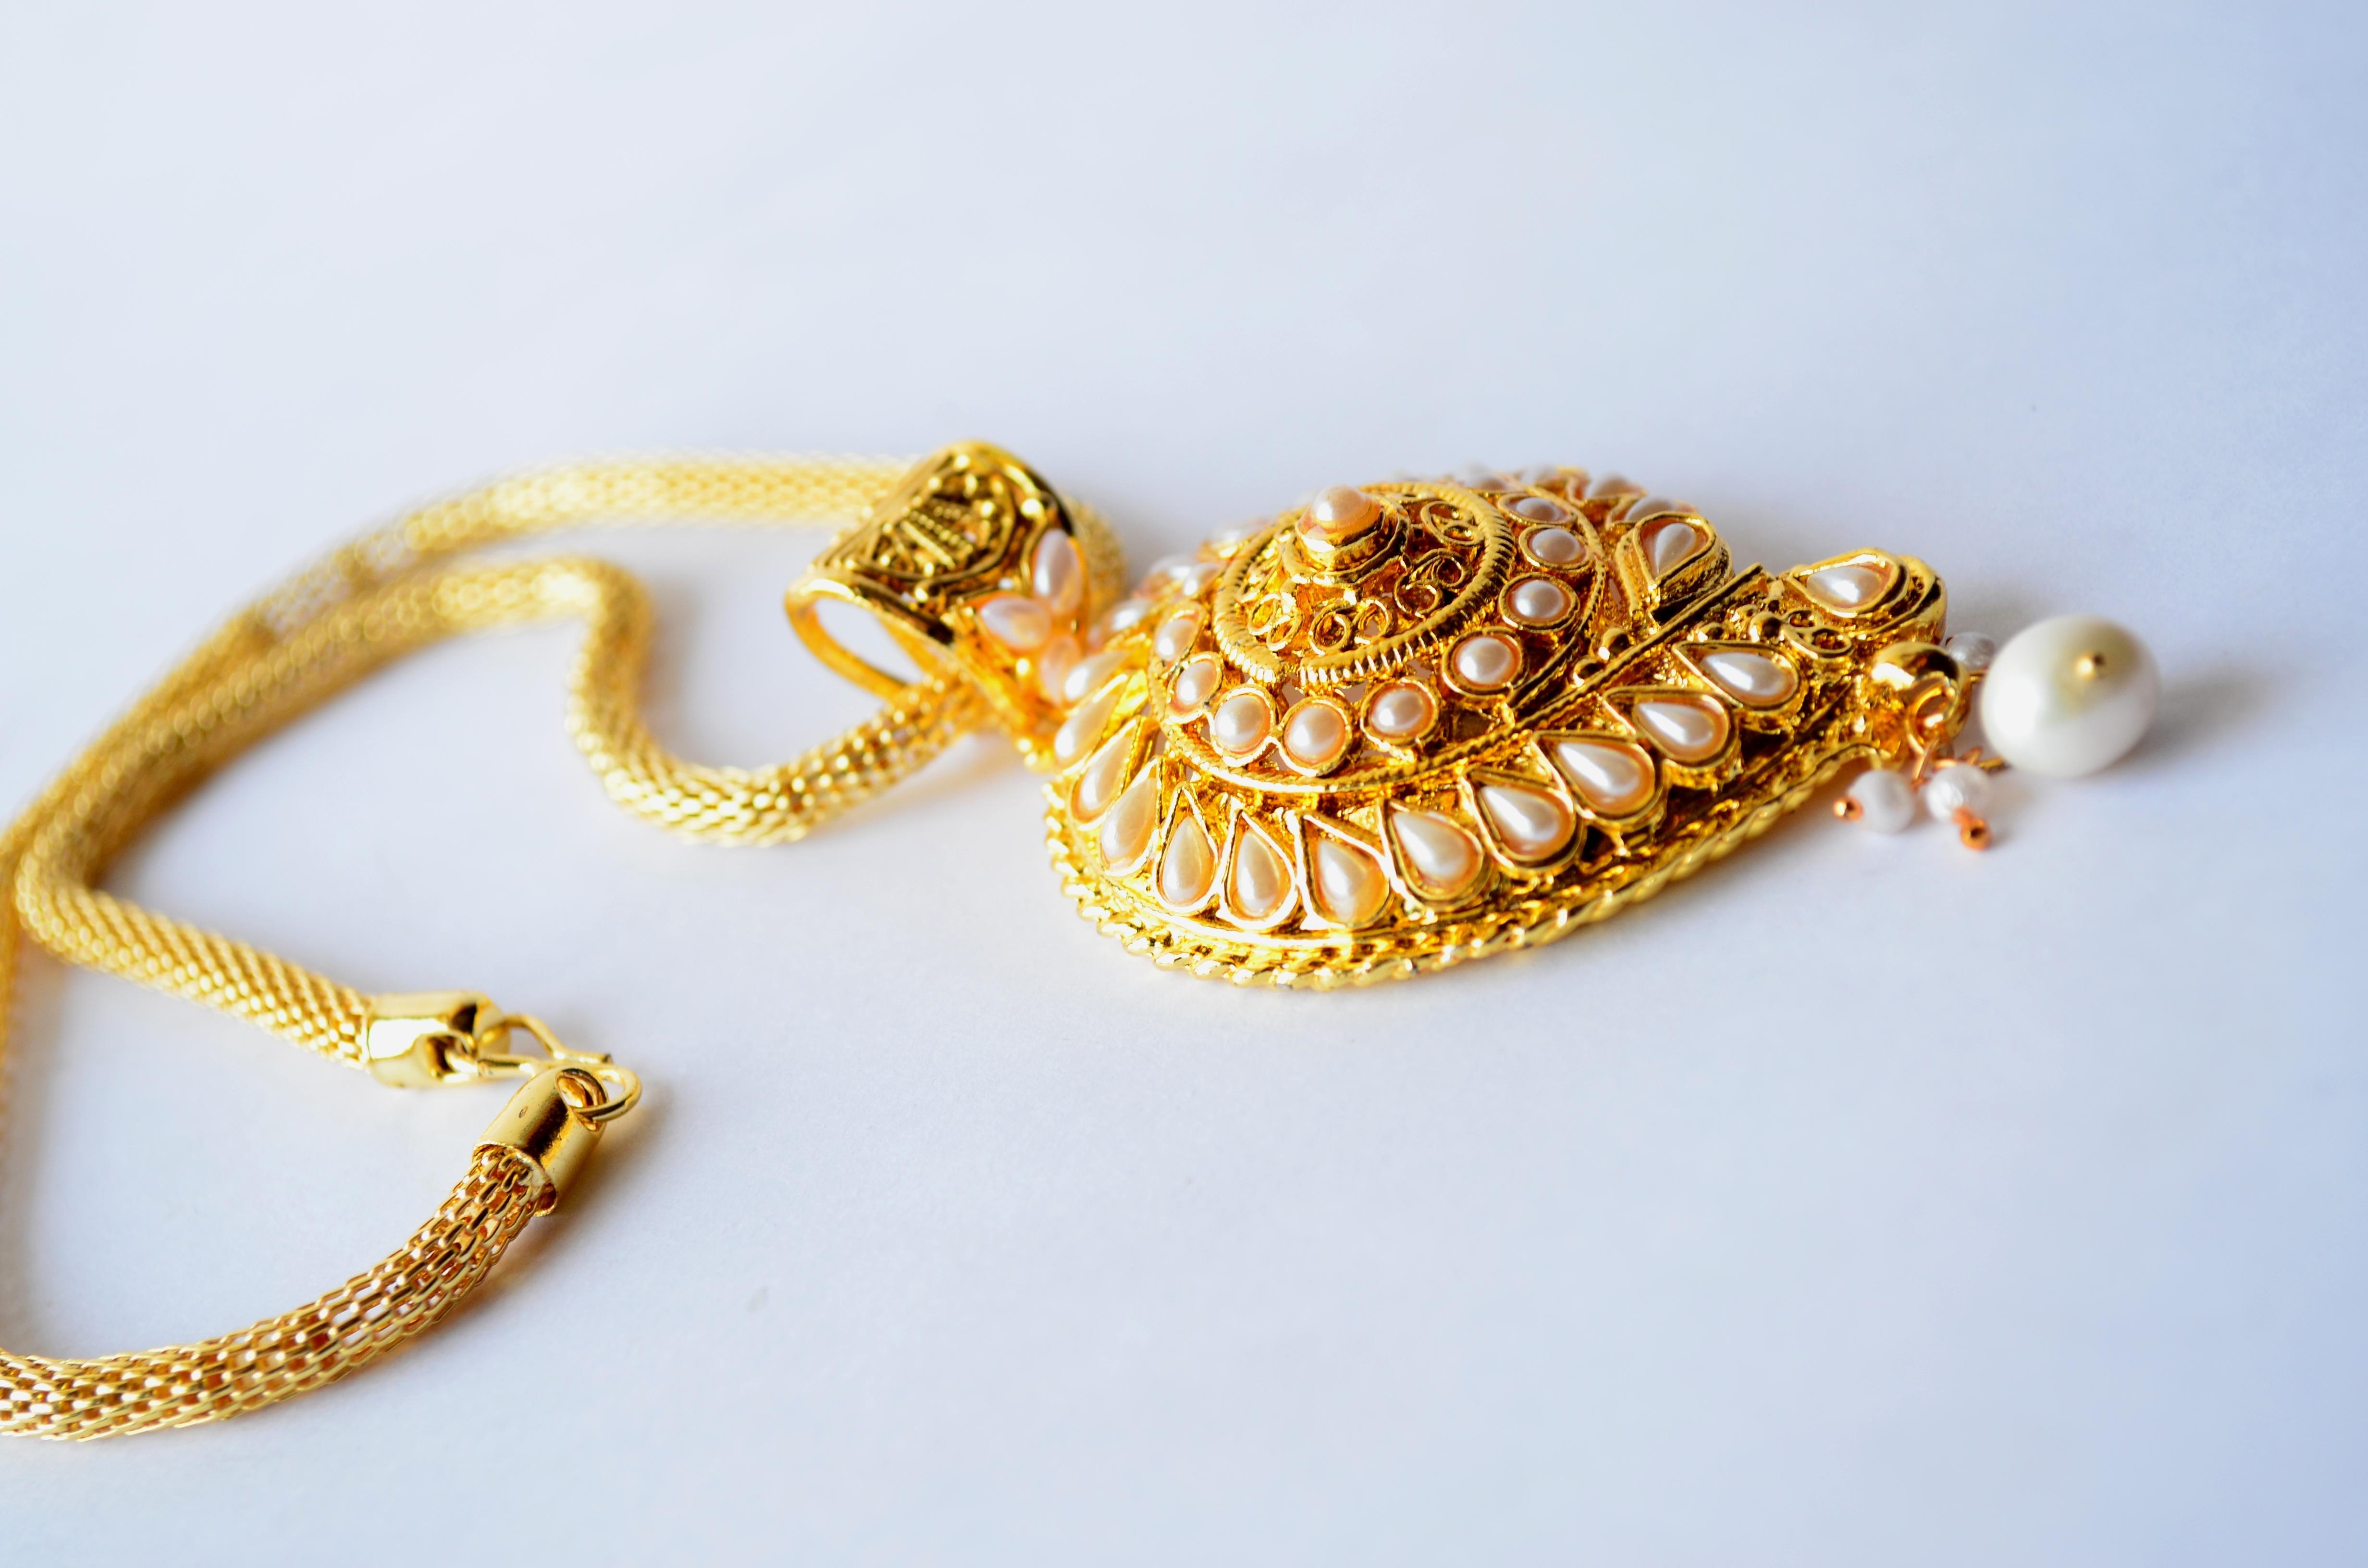 Free images chain metal ear jewelry bangle necklace bracelet chain metal ear jewelry bangle necklace bracelet jewellery gold brass ornaments pendant brooch fashion accessory aloadofball Gallery